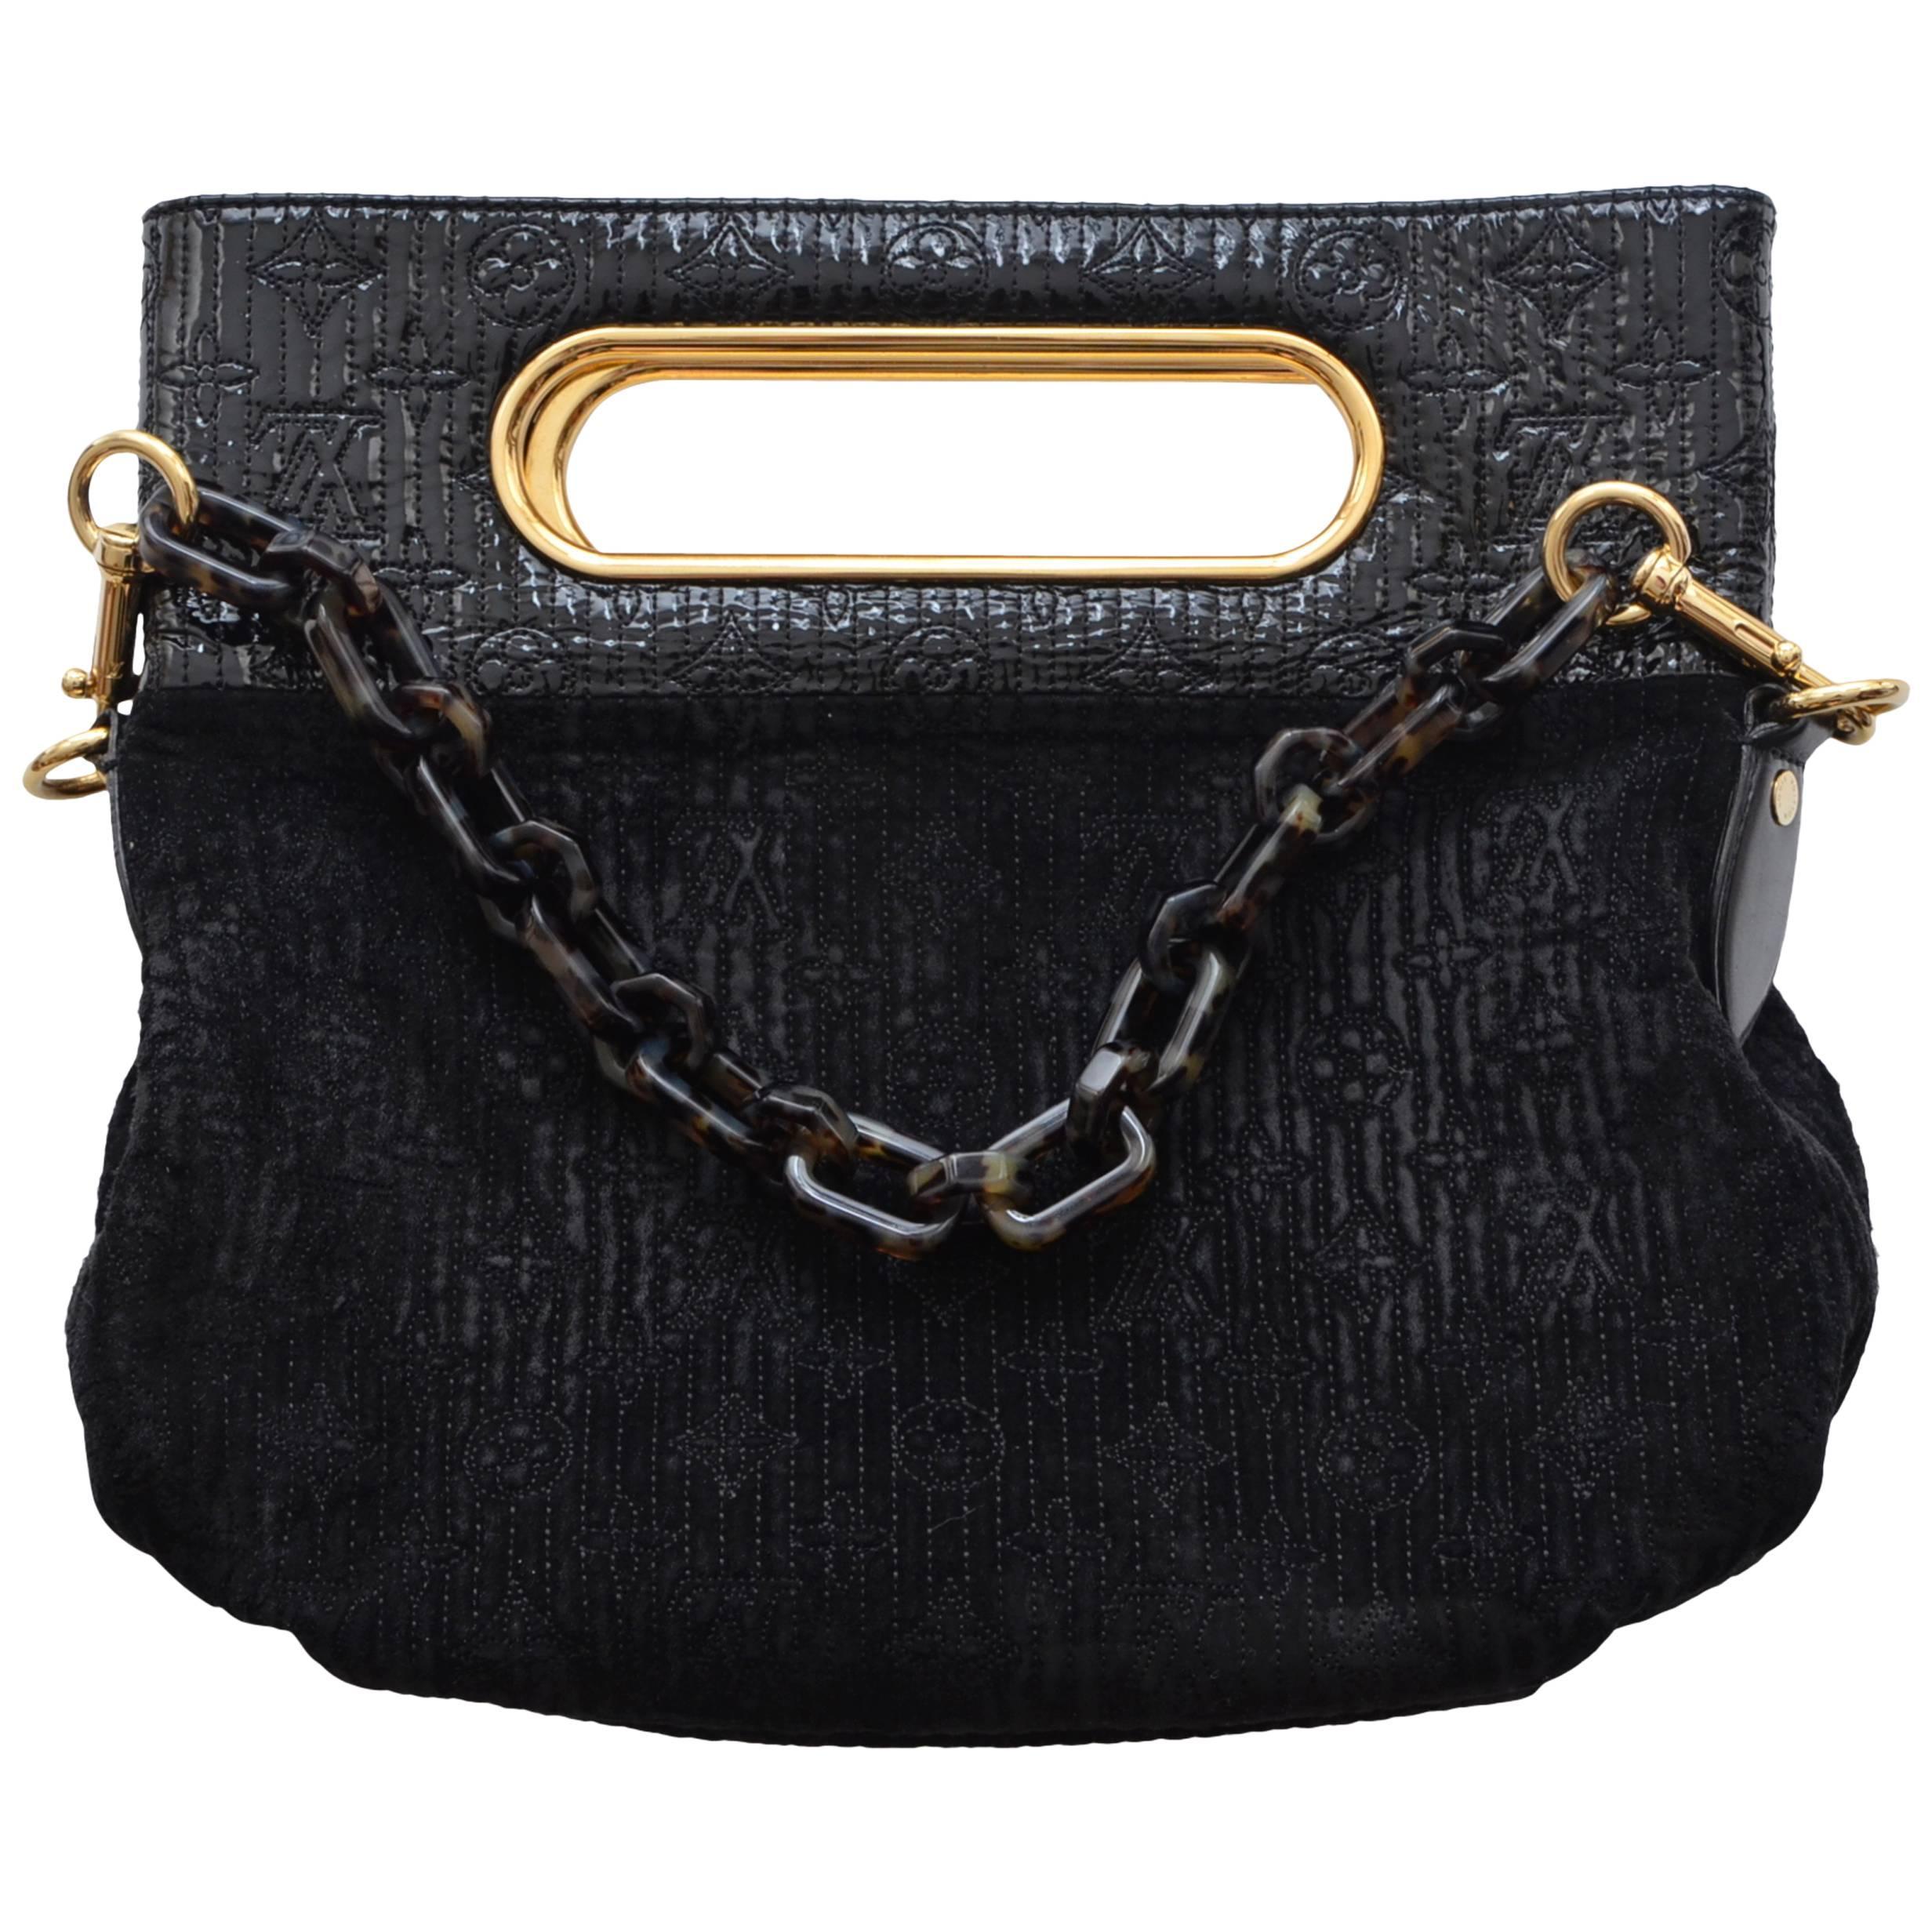 7c38316a5902 Louis Vuitton Velvet LV Print Handbag Clutch For Sale at 1stdibs